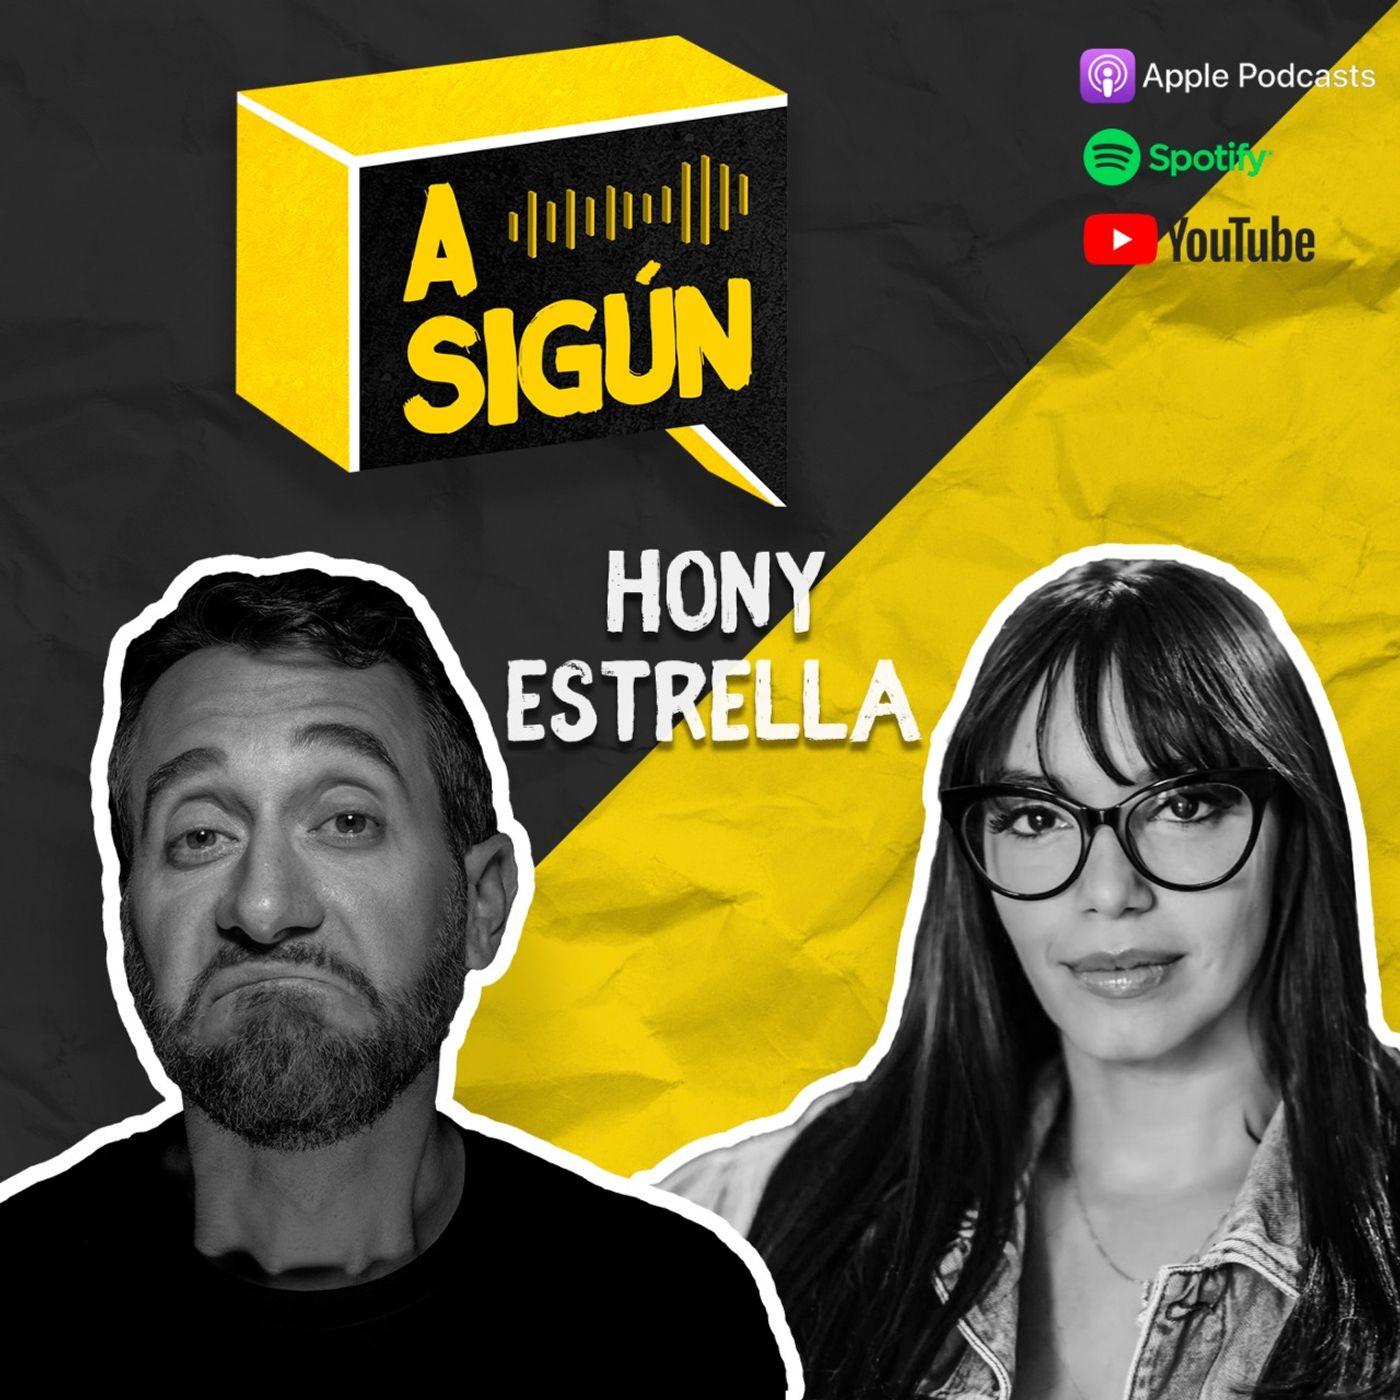 015. A SIGÚN: Honey Estrella